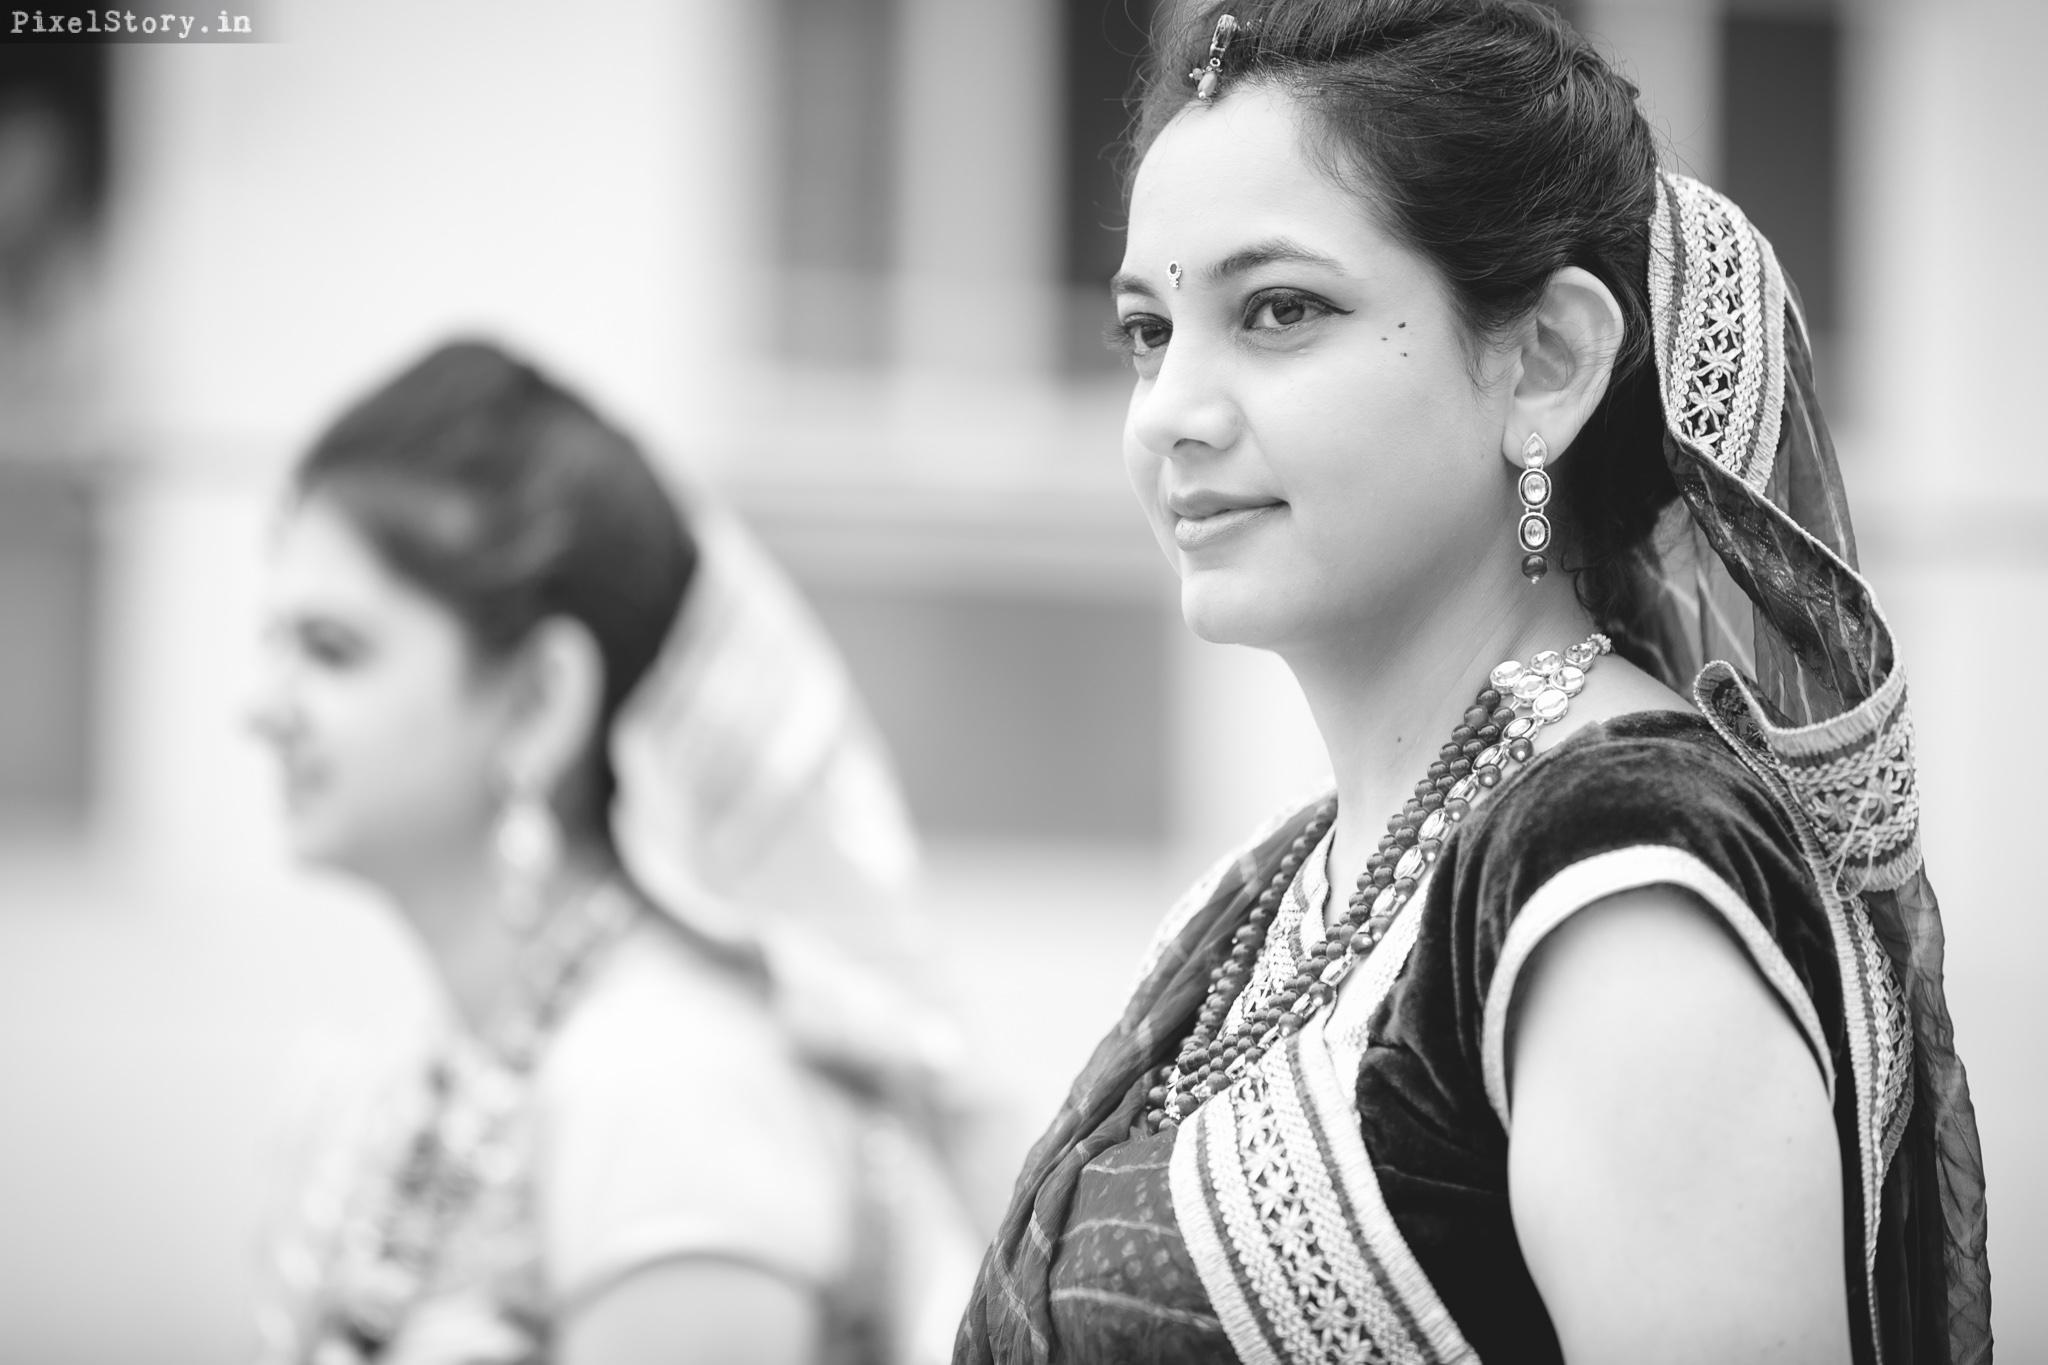 PixelStory-Ganesh-Utsav-2017-157.jpg